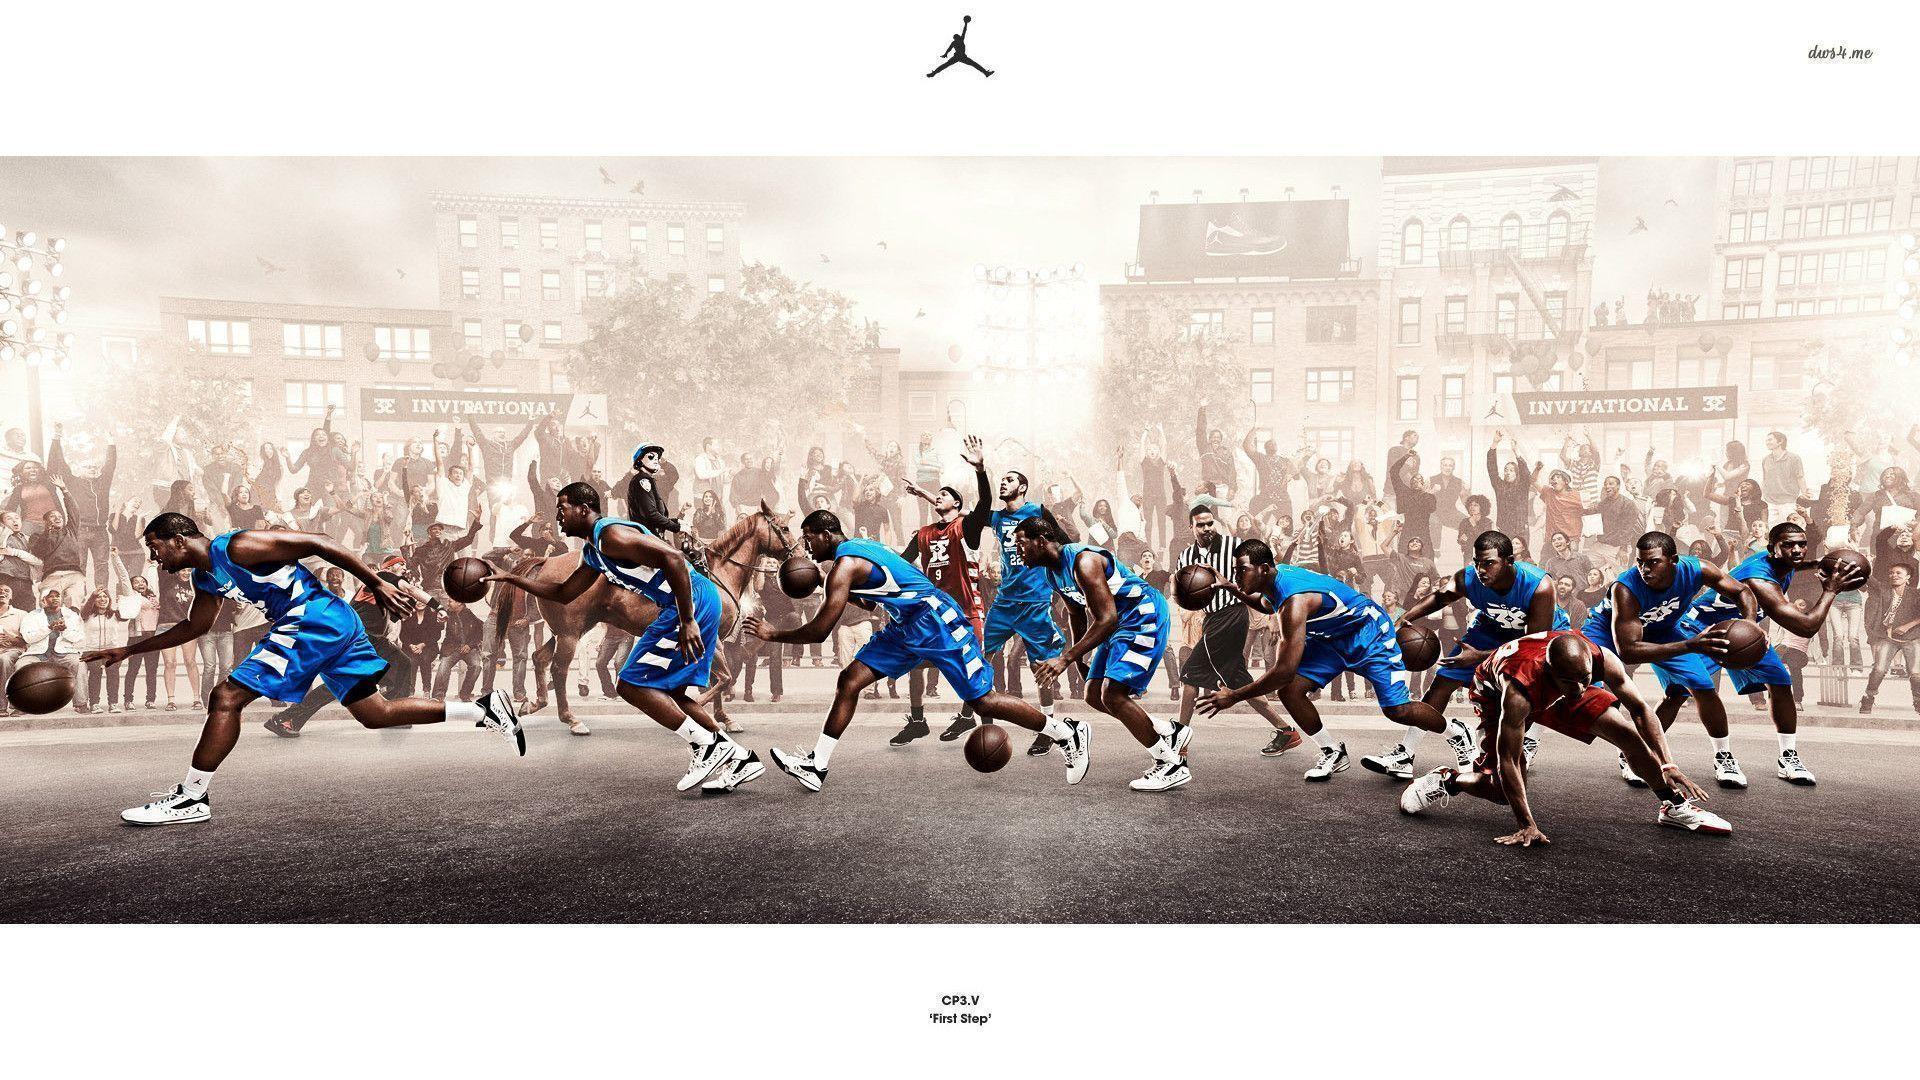 Sport Wallpaper Shoes Outlet: Jordan Shoes Wallpapers